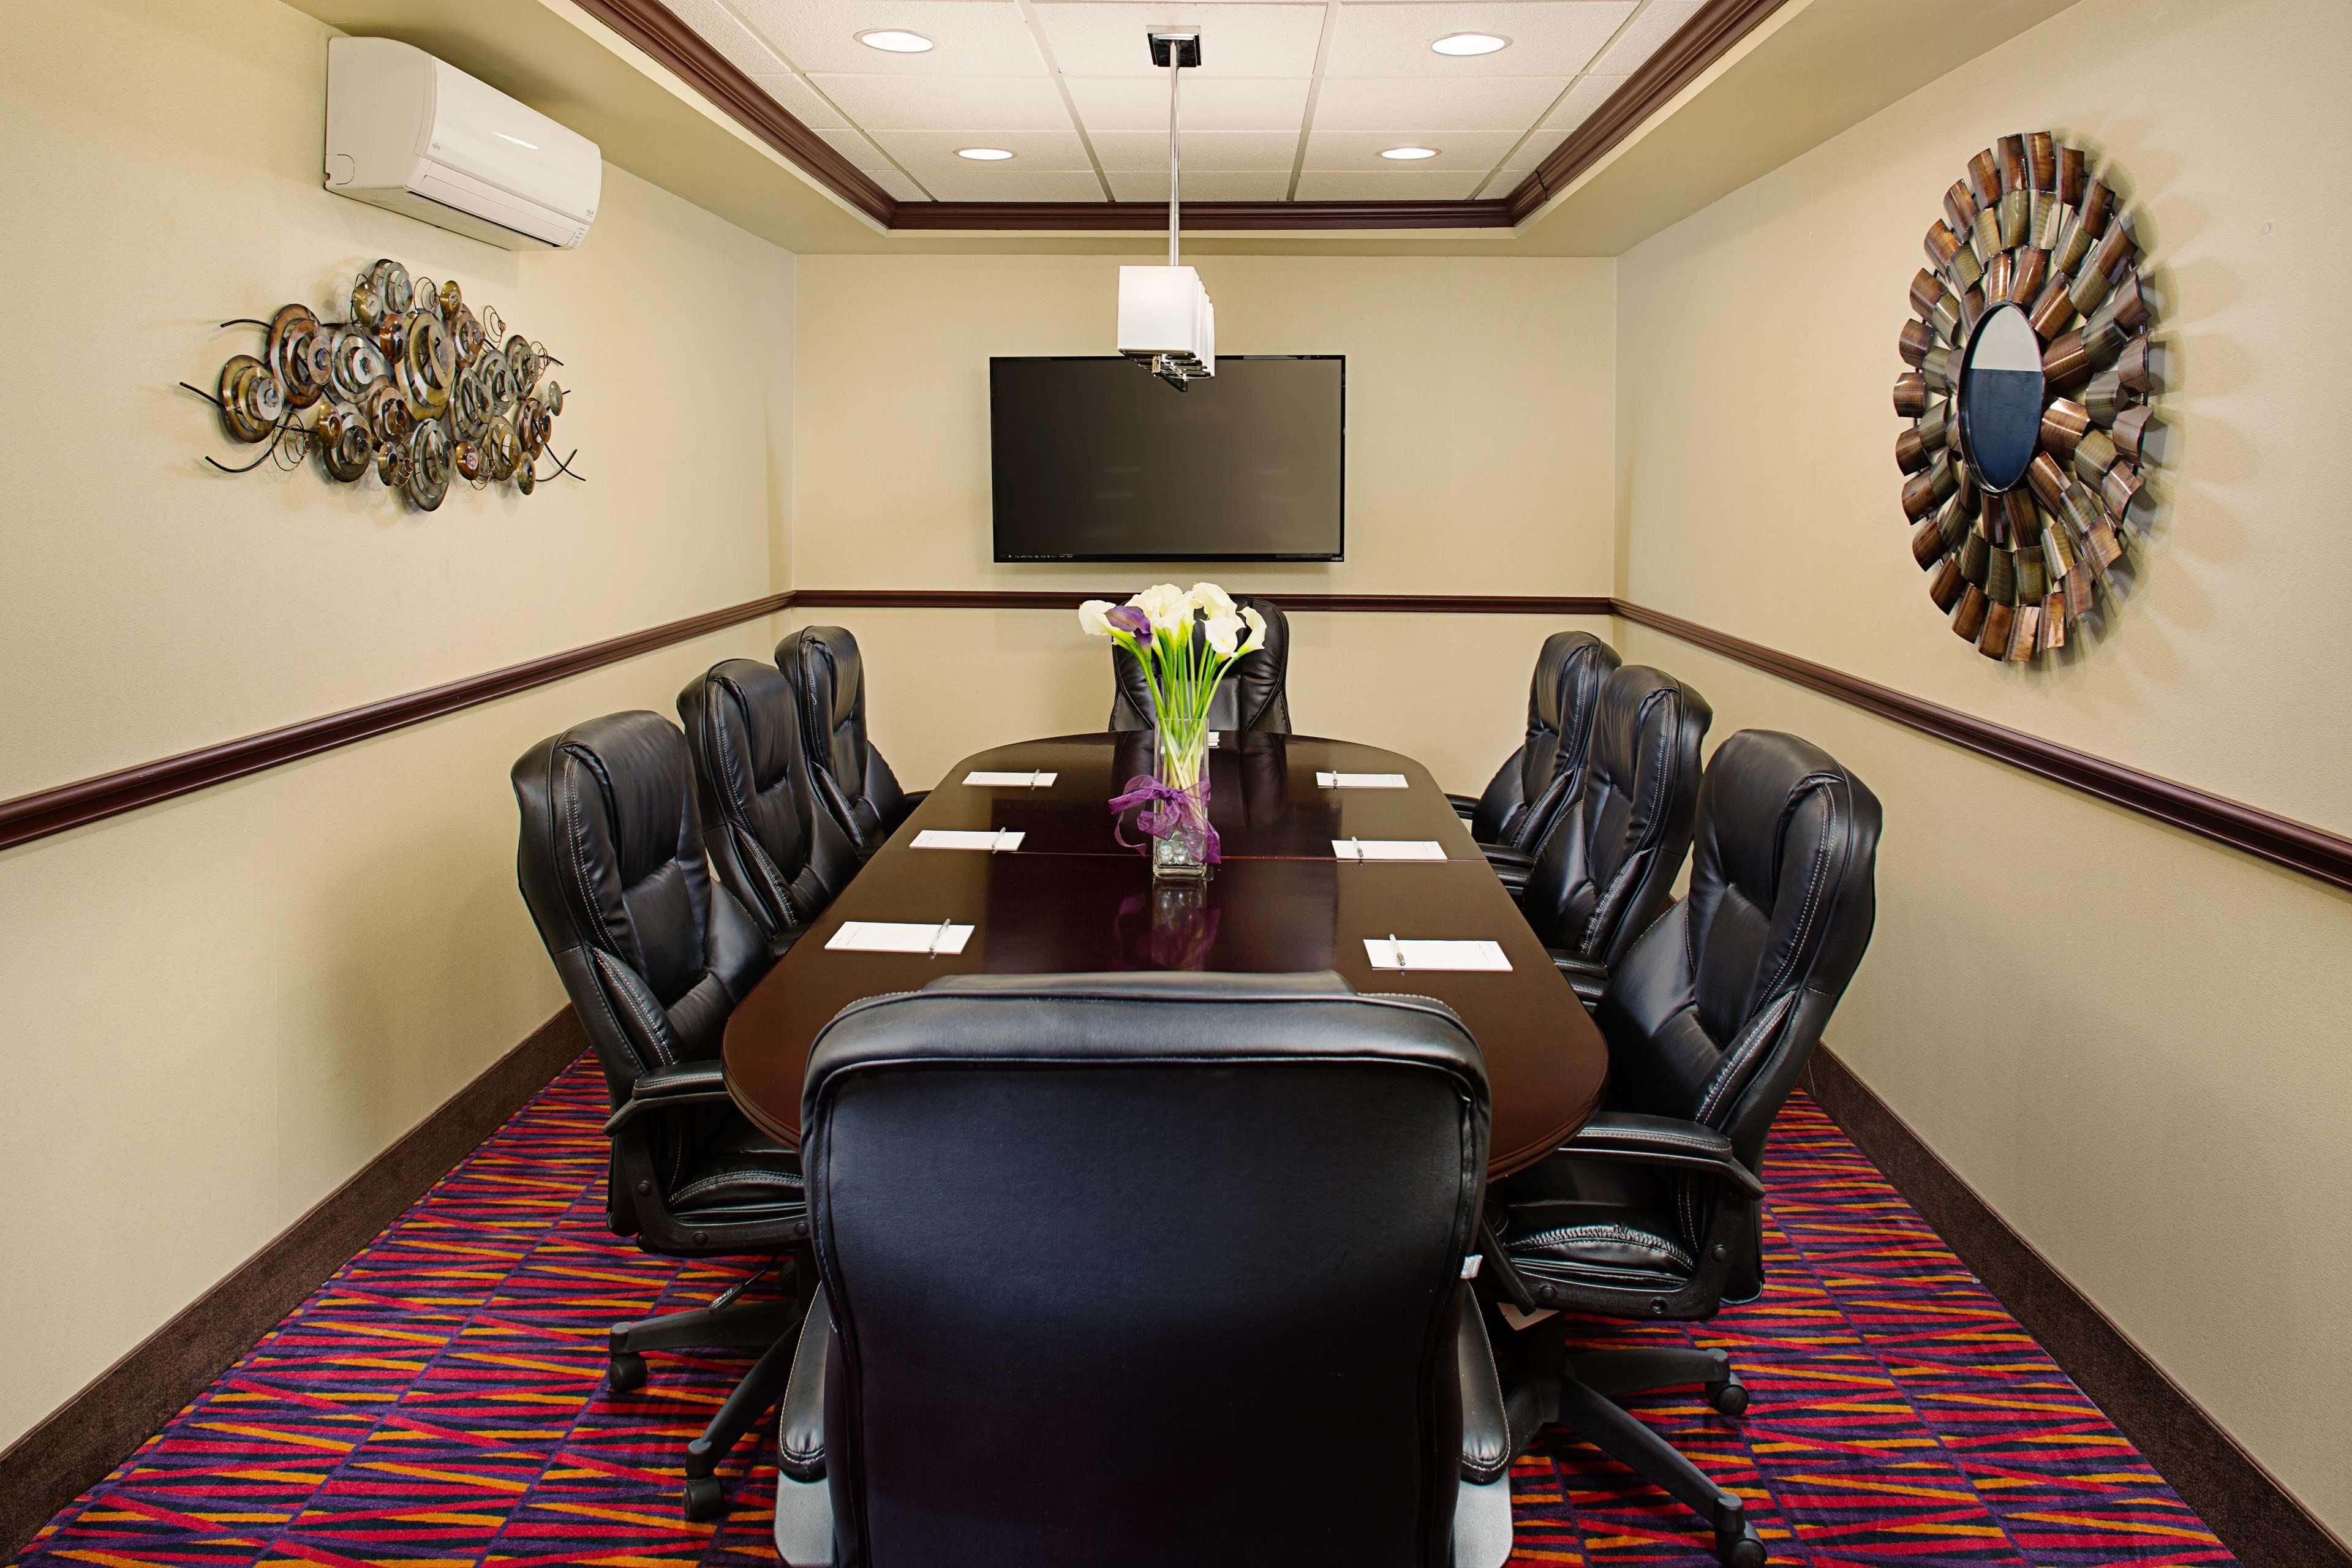 Hampton Inn & Suites Dallas/Lewisville-Vista Ridge Mall, TX image 37